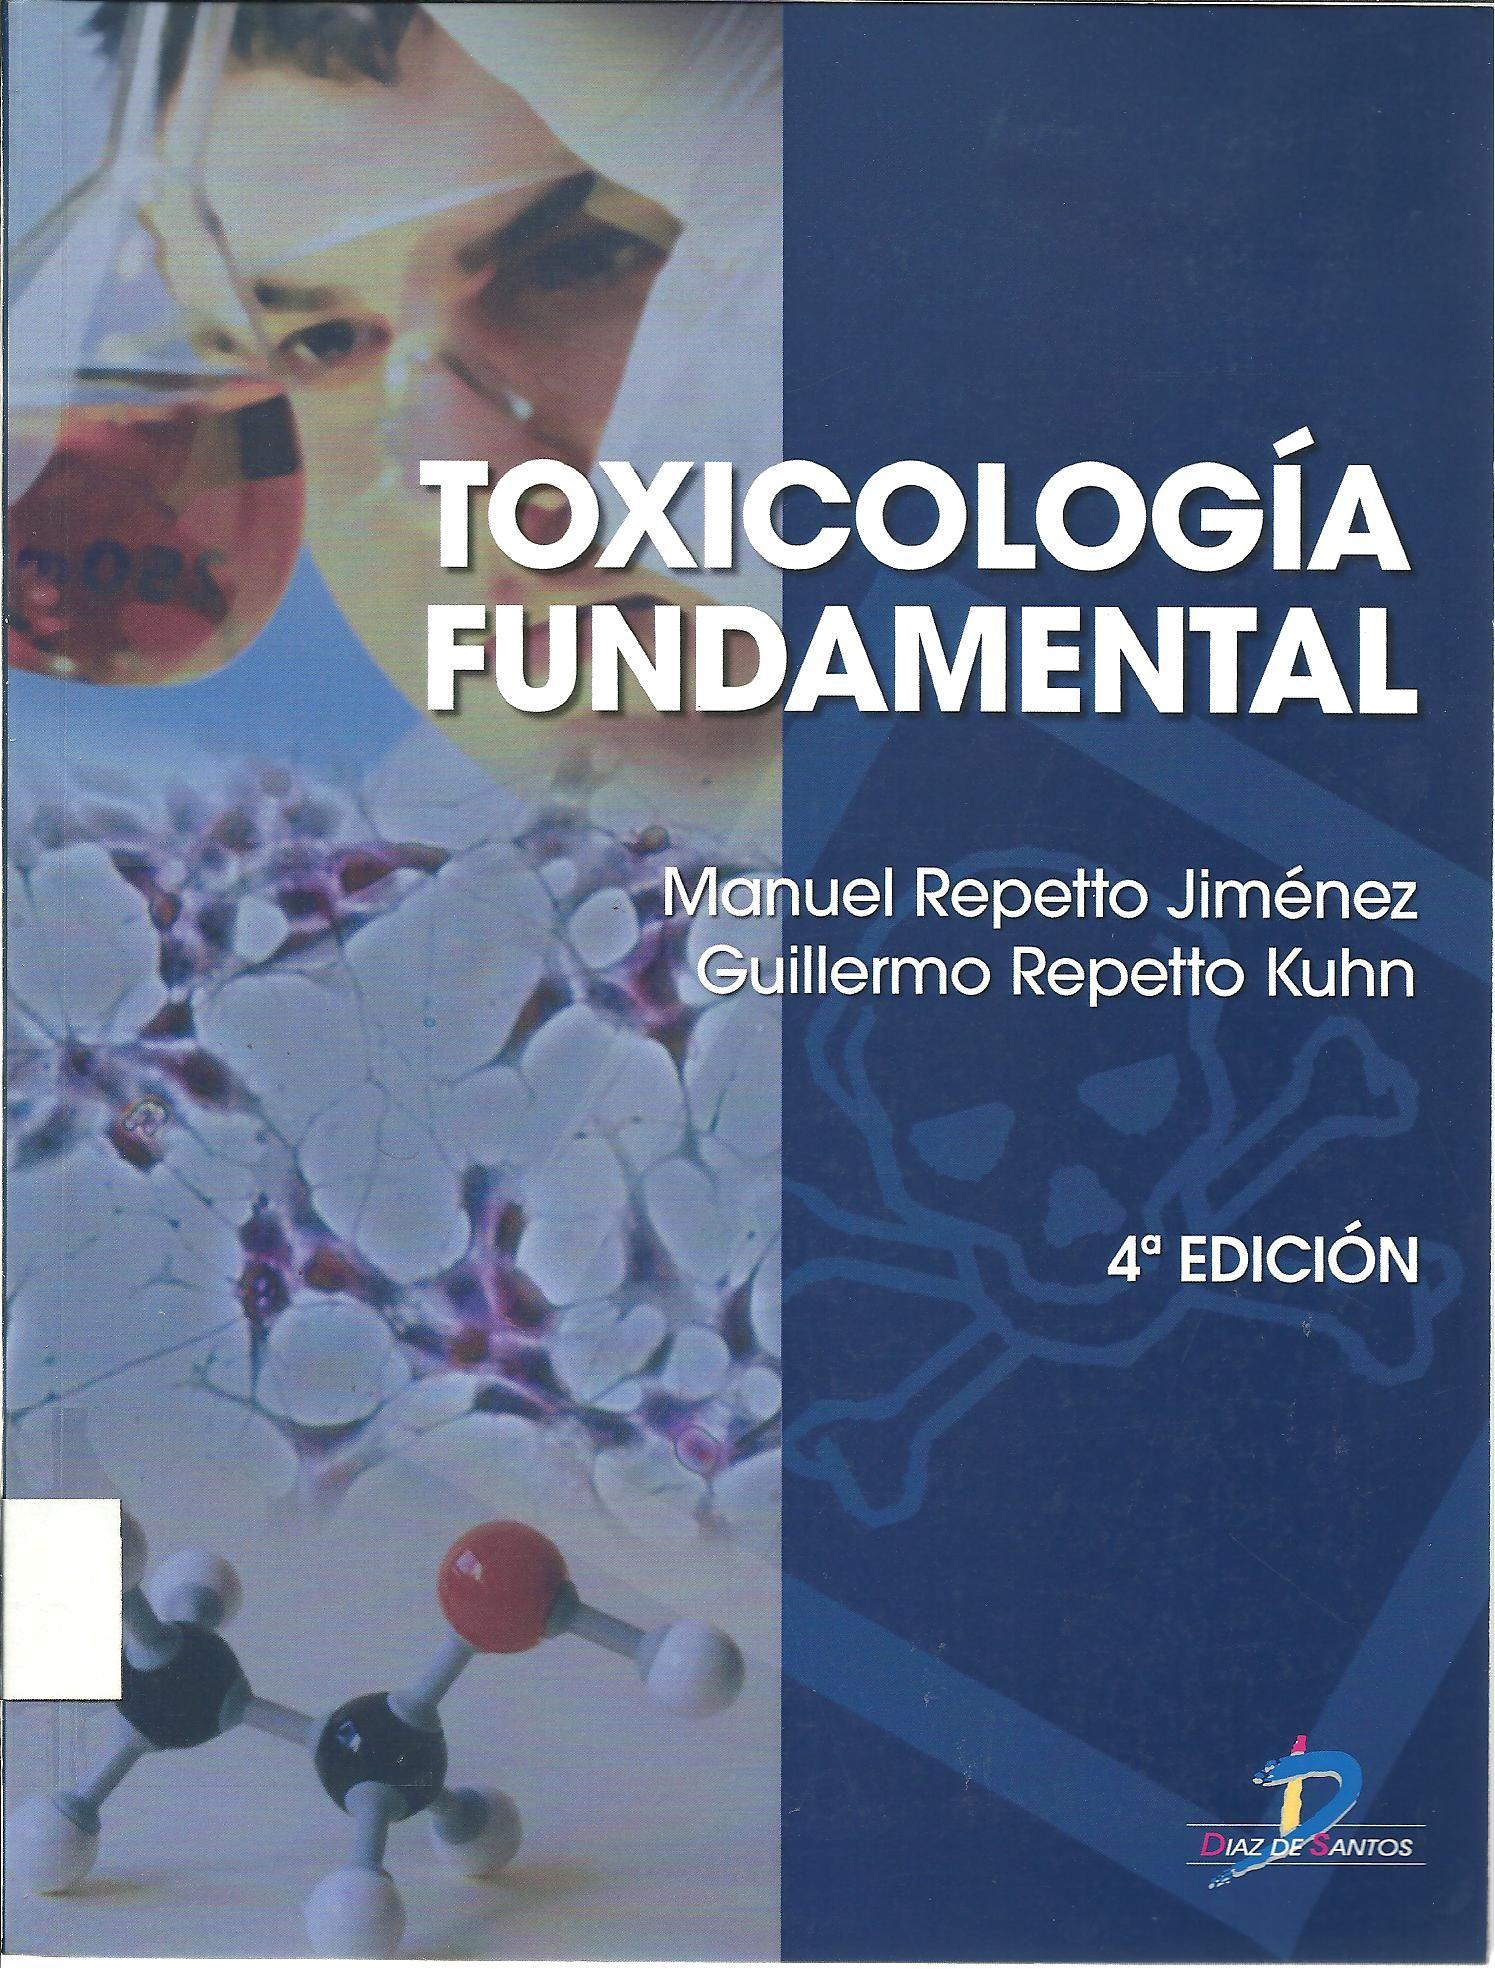 Repetto Jiménez Manuel Toxicología Fundamental 4a Ed 4 Ej Fundamental Arduino Repetto